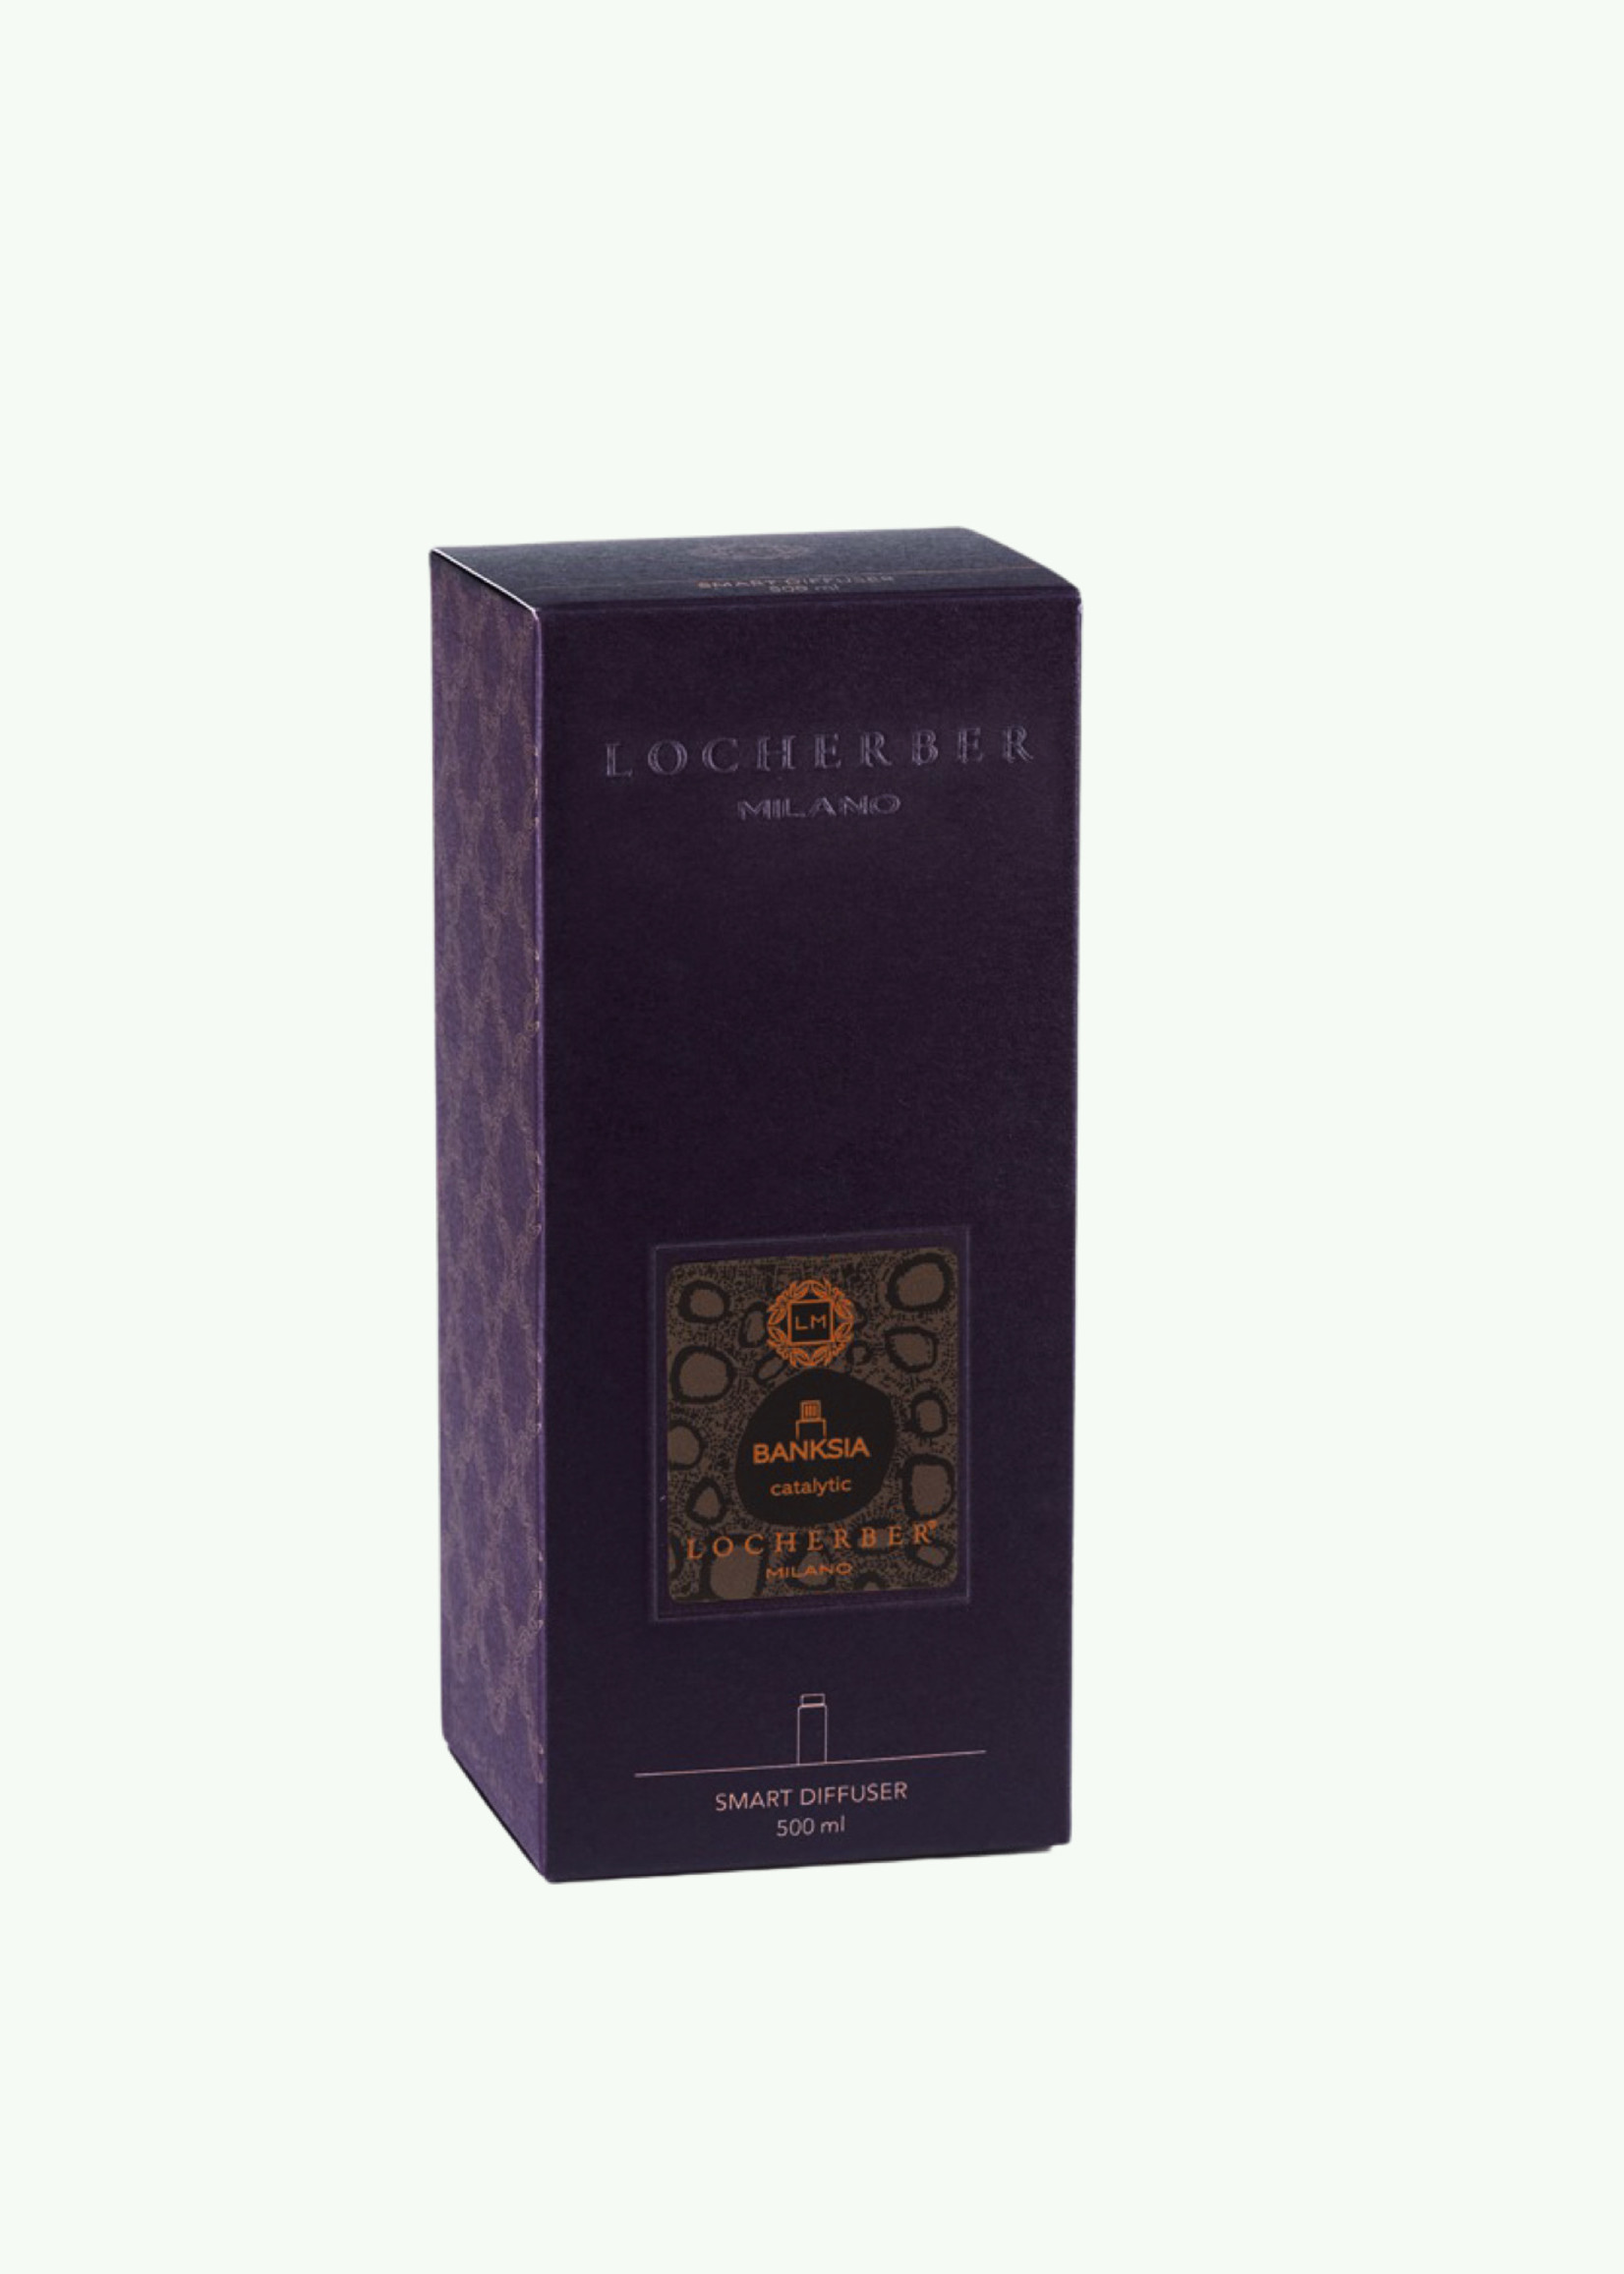 Locherber Locherber - Banksai - Refill bottle 500 ml